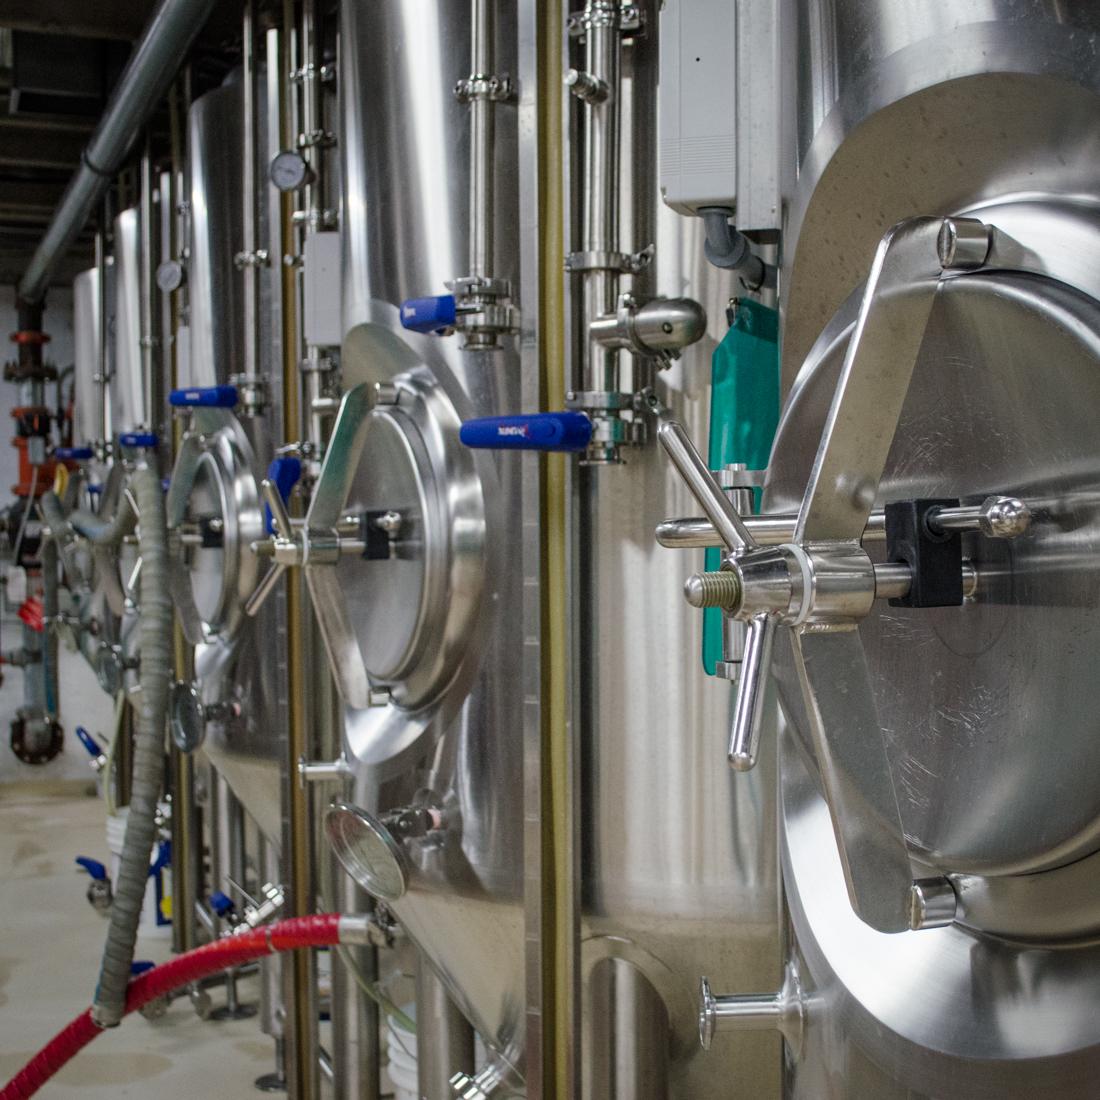 craft beer tank